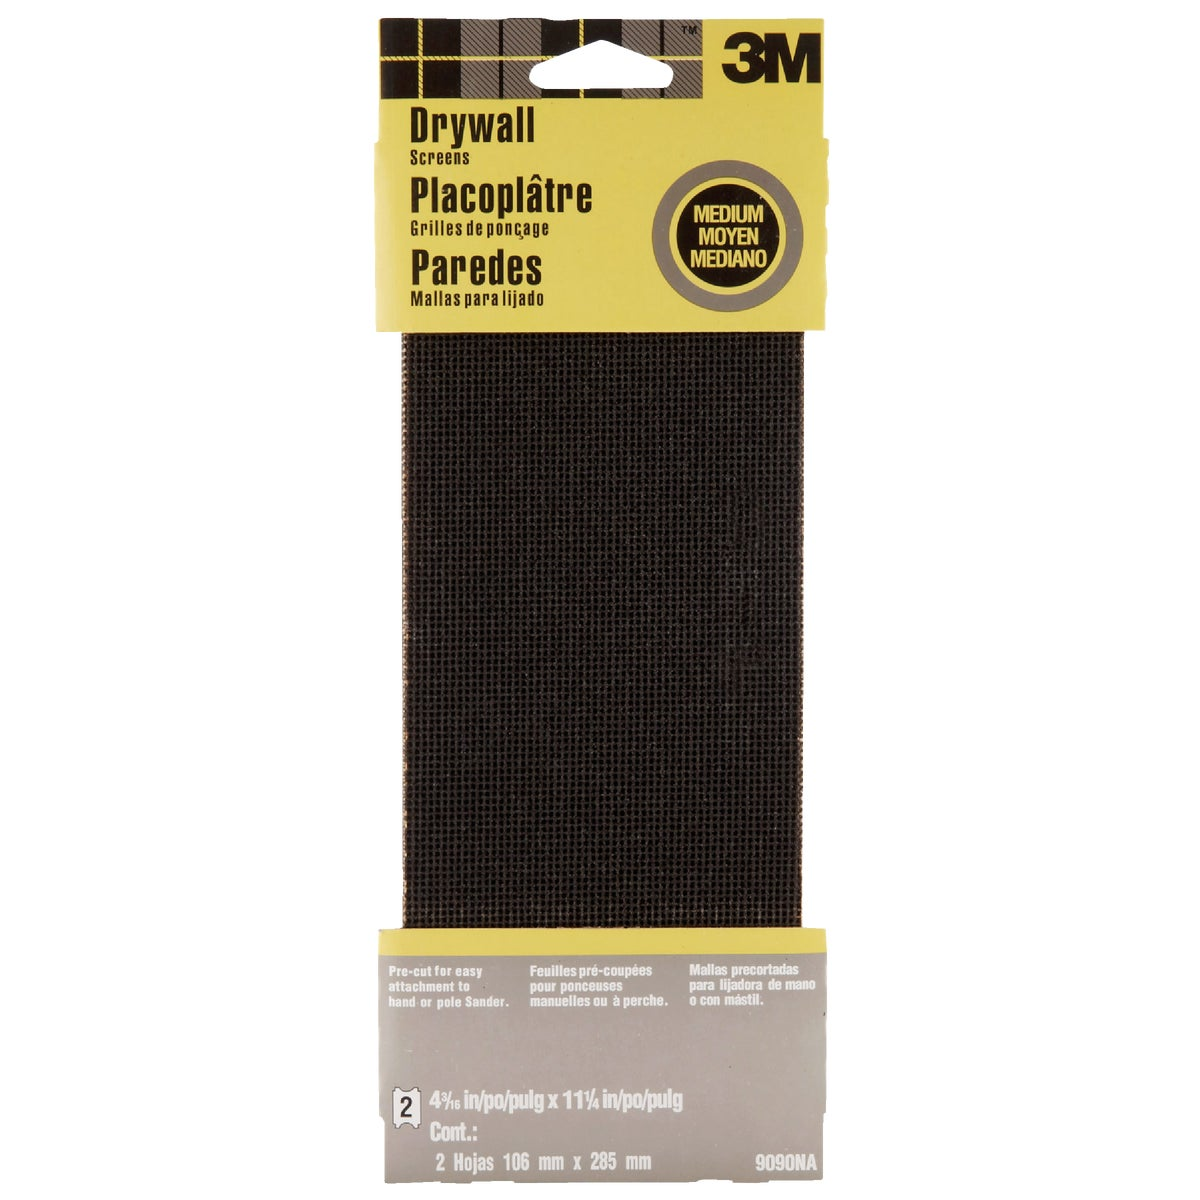 3M Medium Grade 4-3/16 In. x 11-1/4 In. Precut Drywall Sanding Screen (2-Pack)